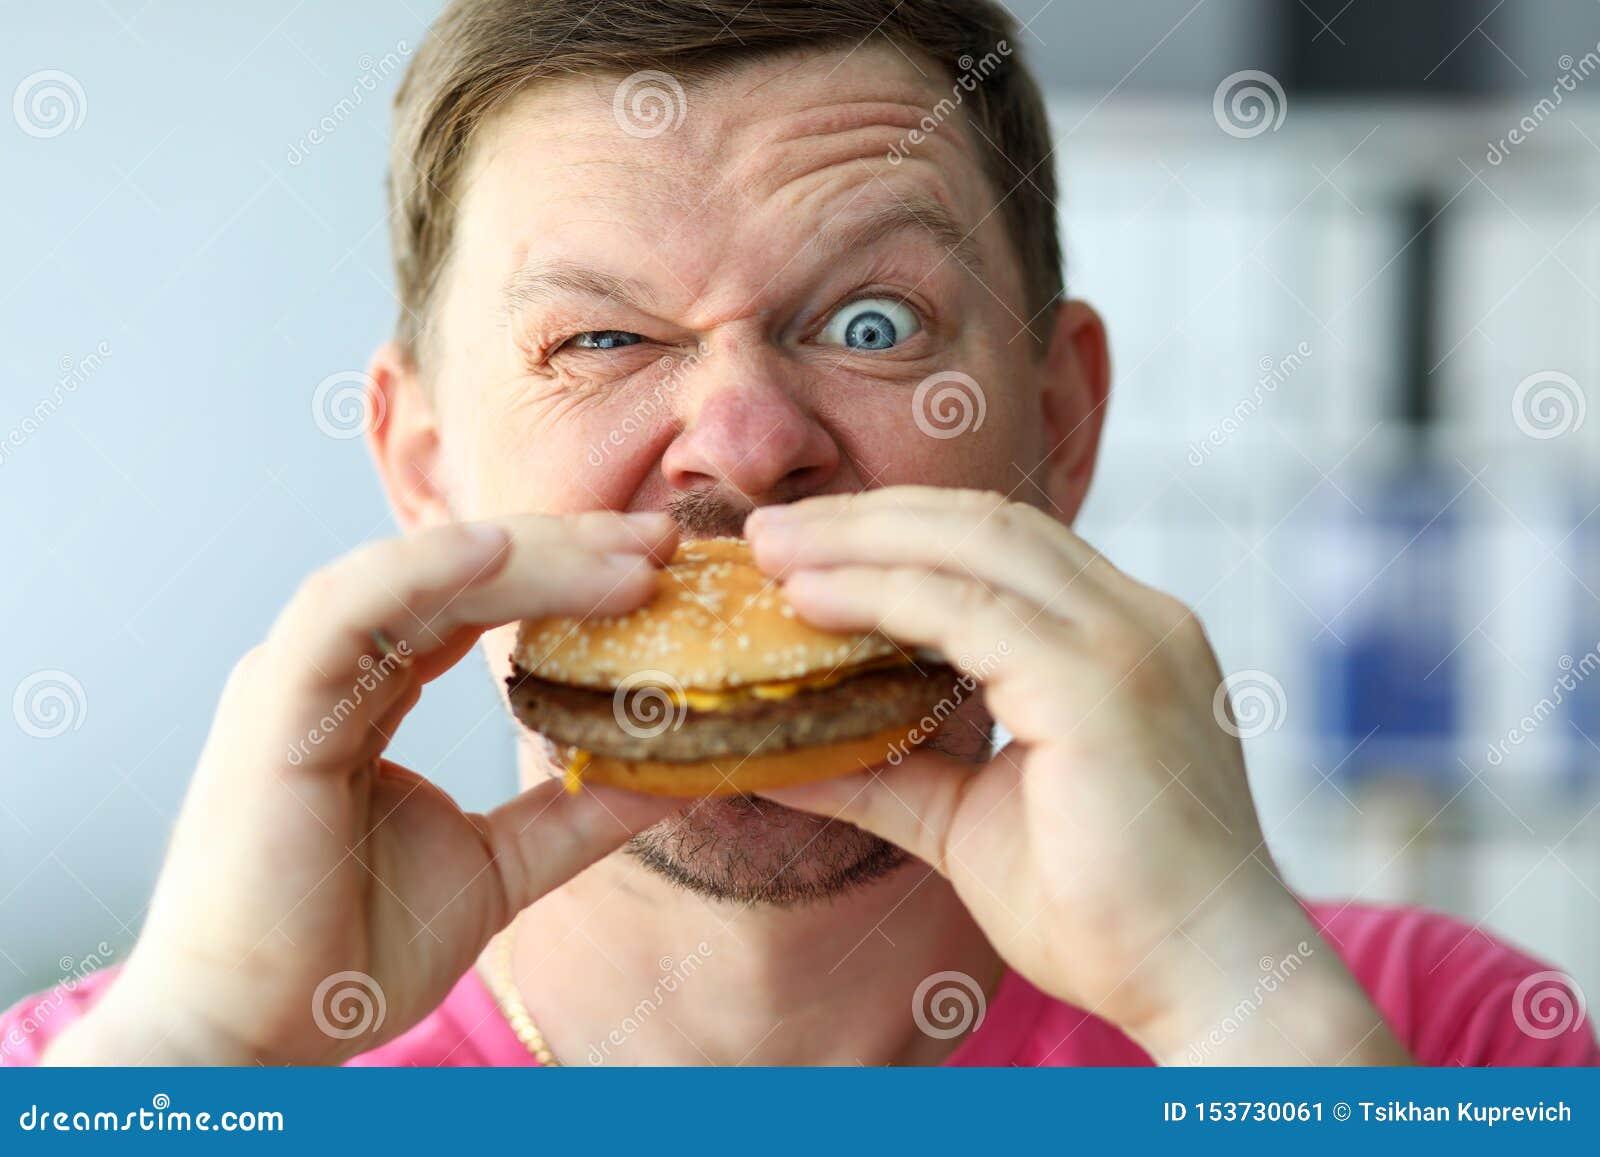 Funny bearded man with idiot facial expression eating big burger